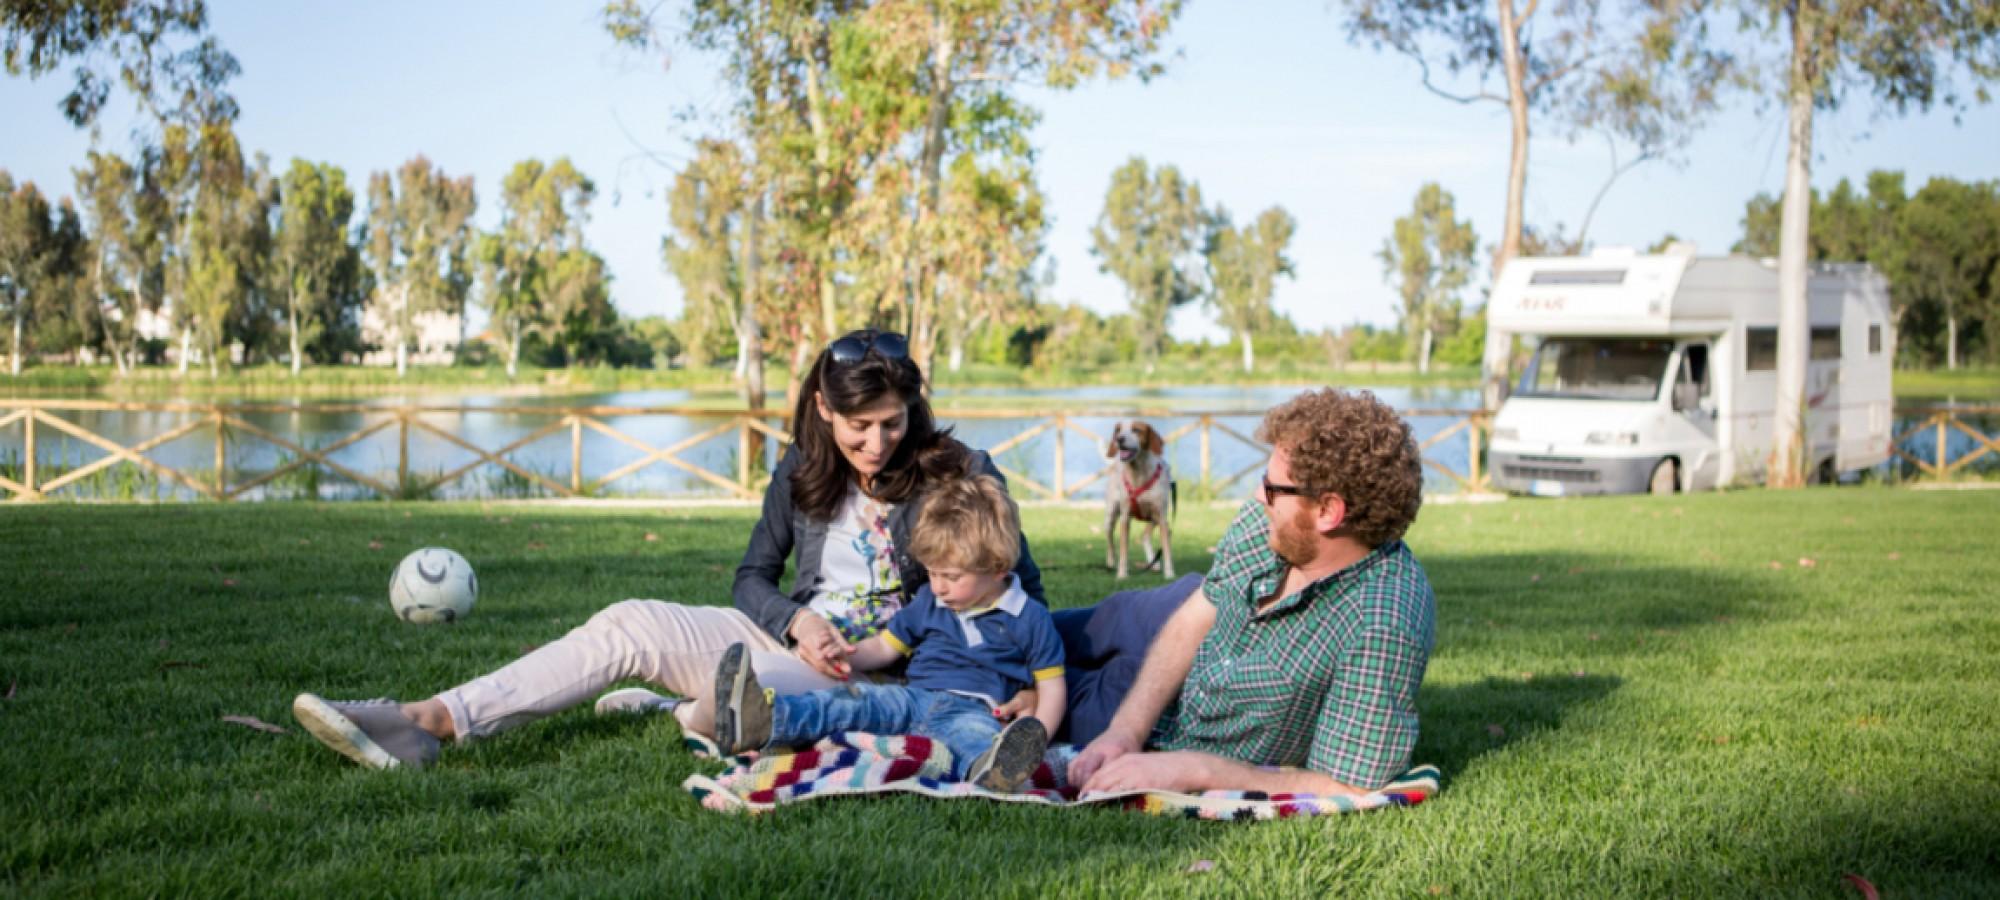 Il parco - Lago di Oz - Food & Soul